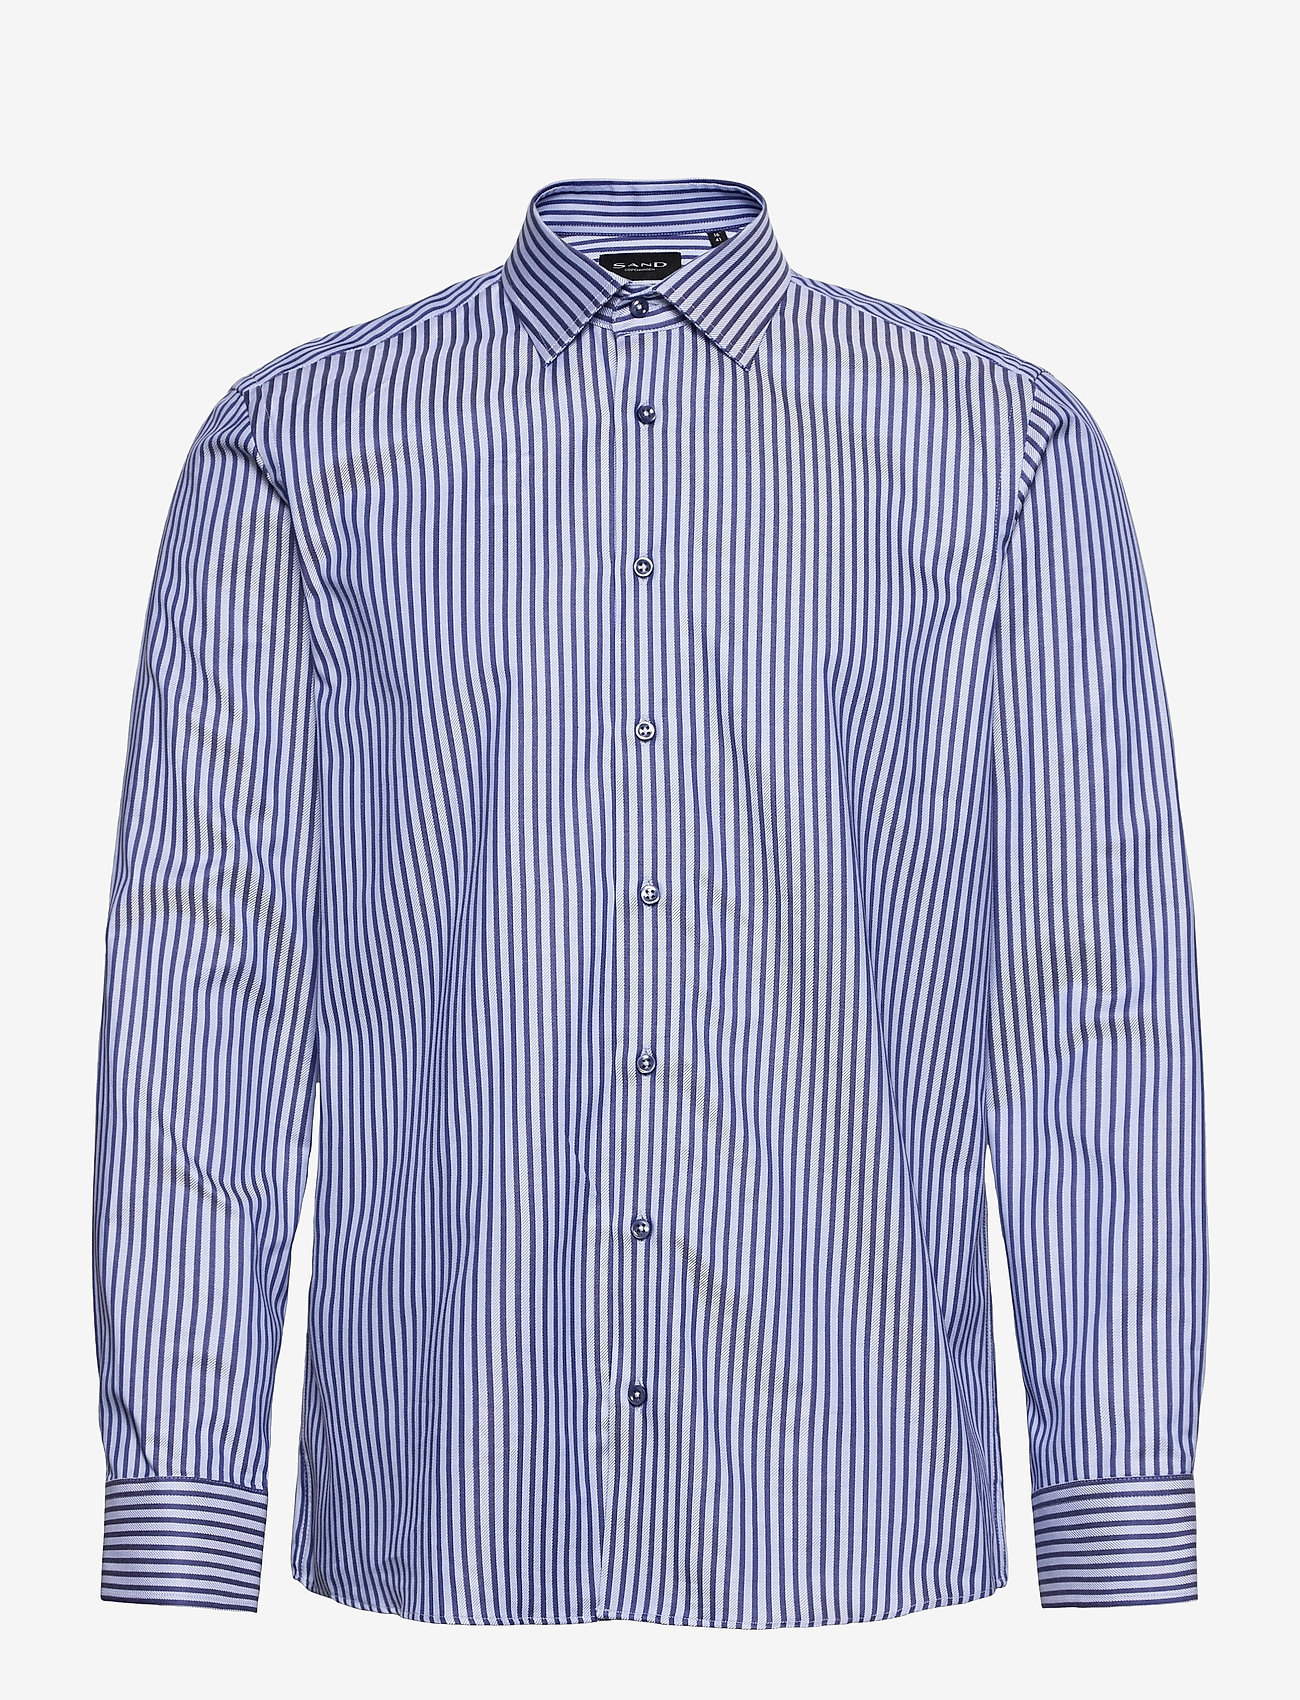 SAND - 8651 - State N 2 - oxford-skjortor - medium blue - 0